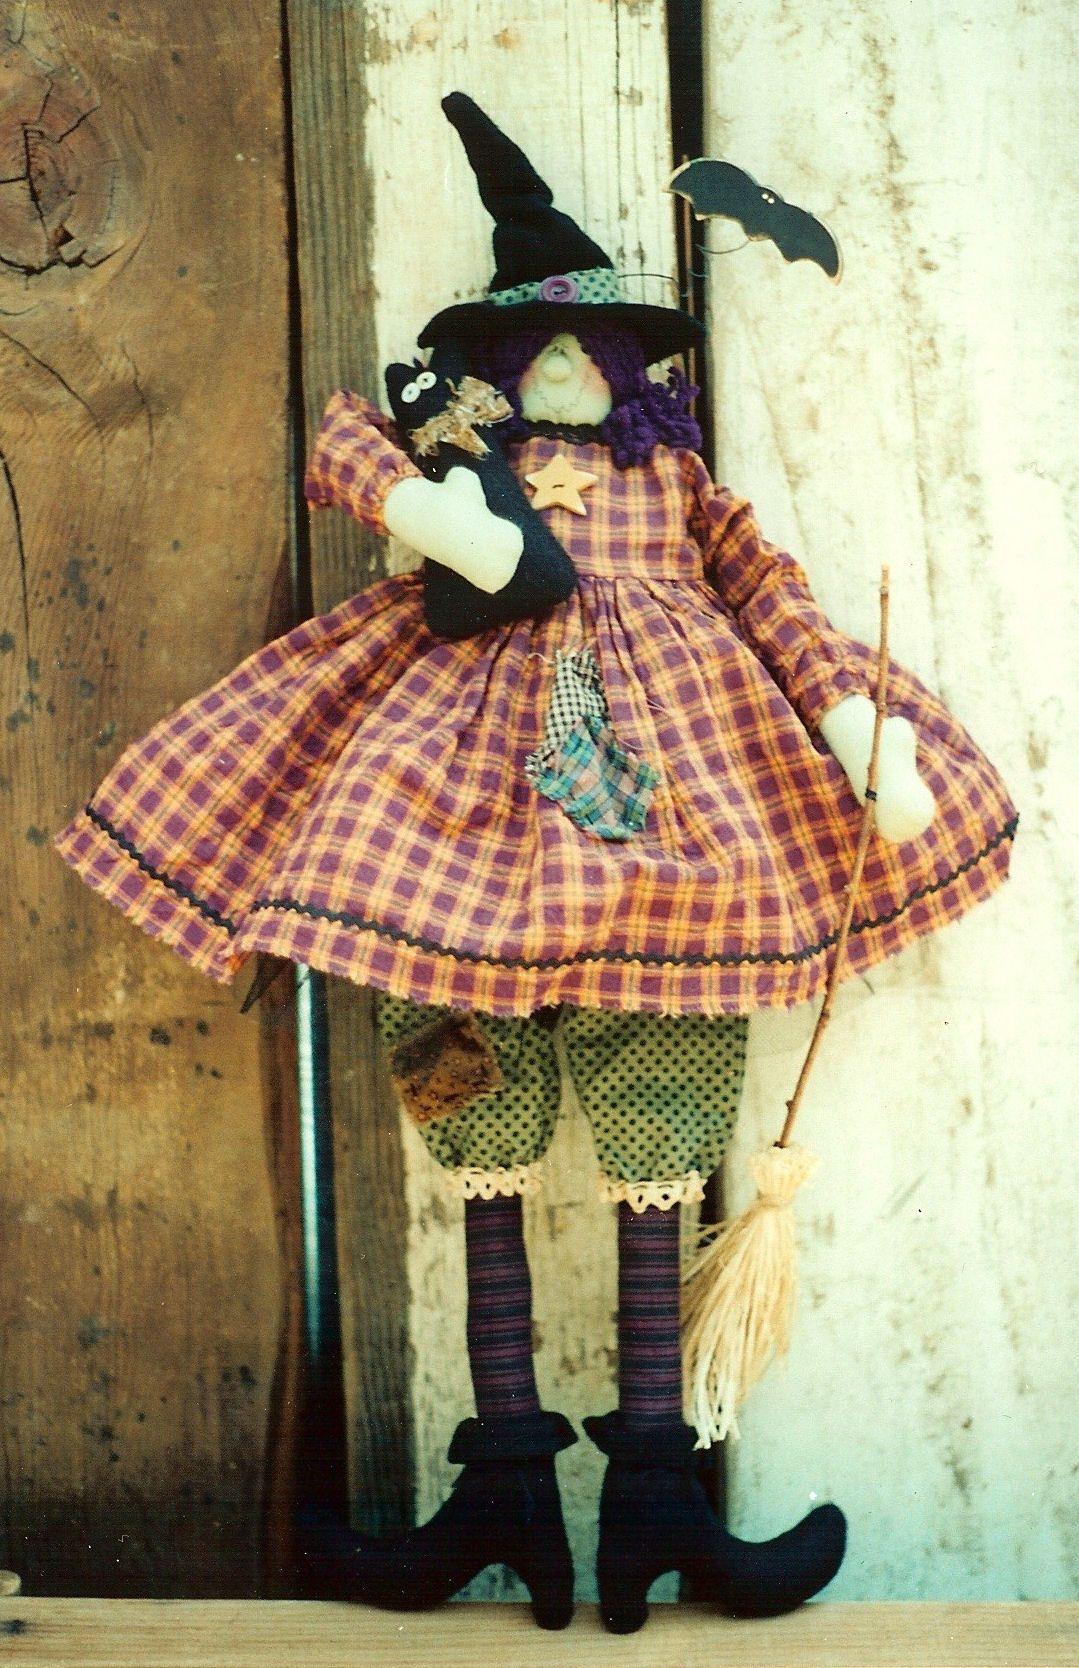 006e Gertrude 'n Salem ePattern